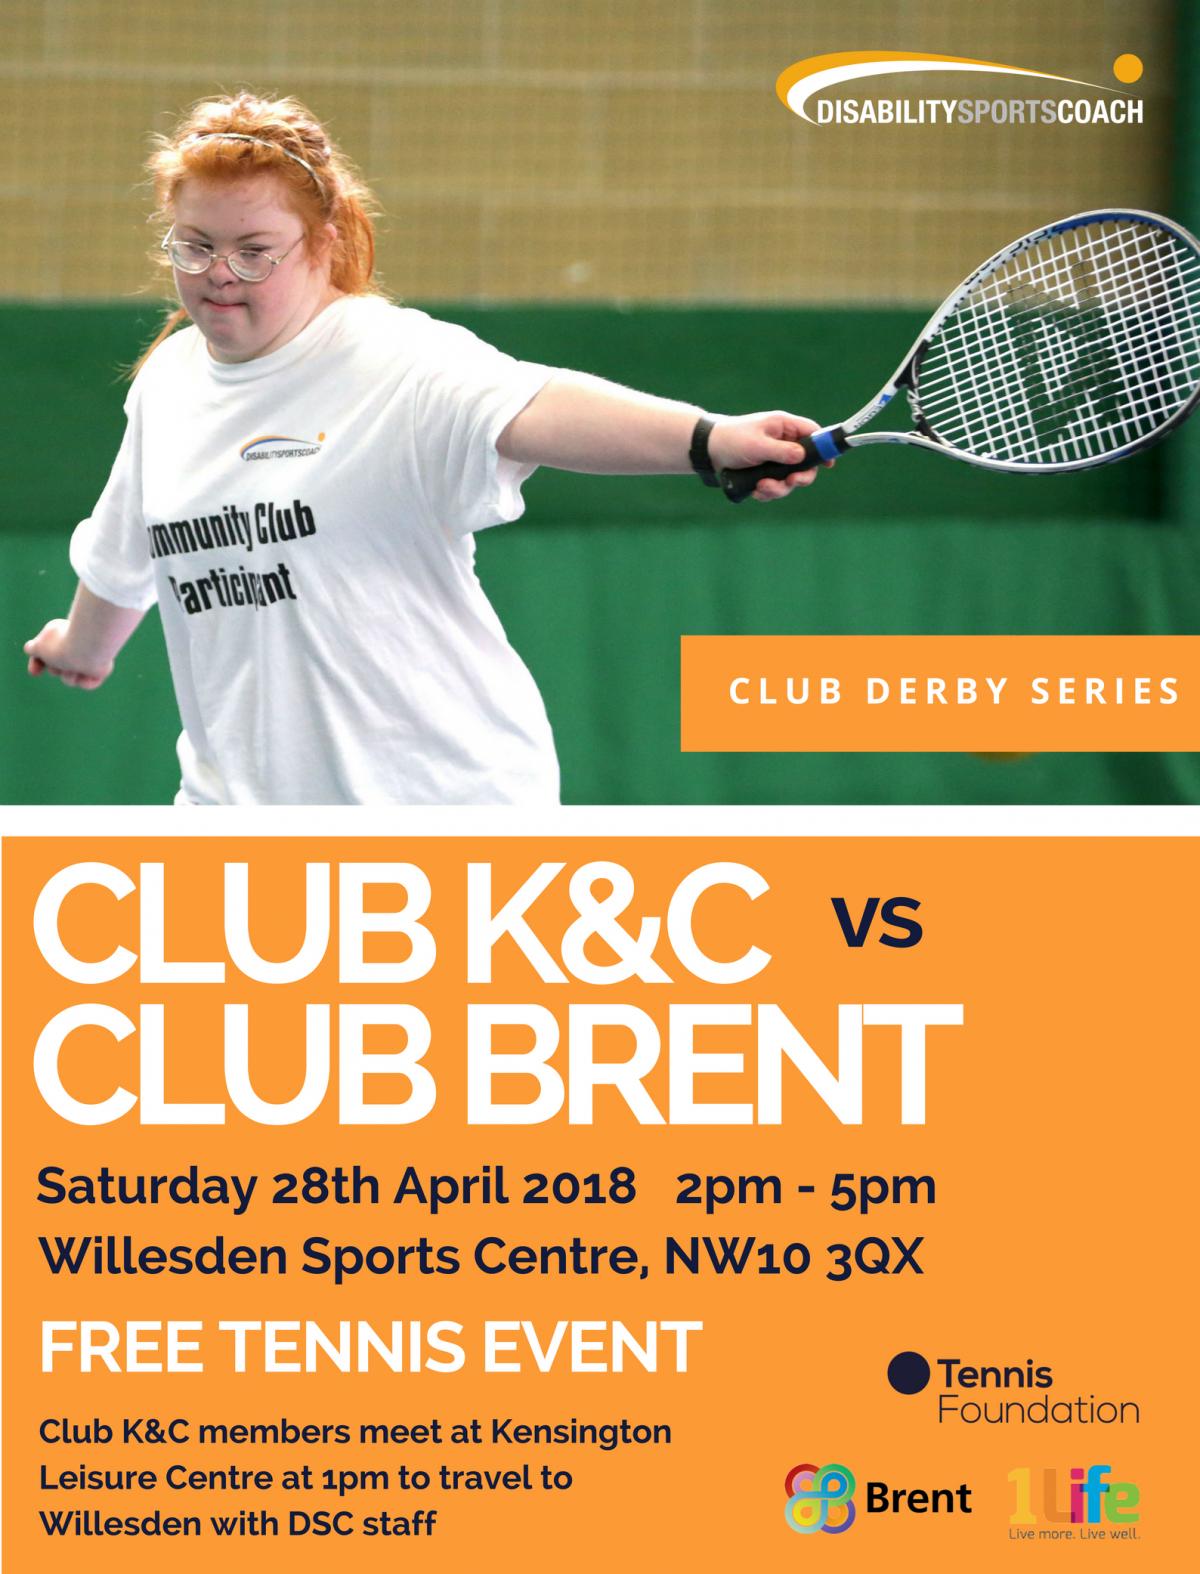 Club Derby Series: Club Brent vs Club K&C